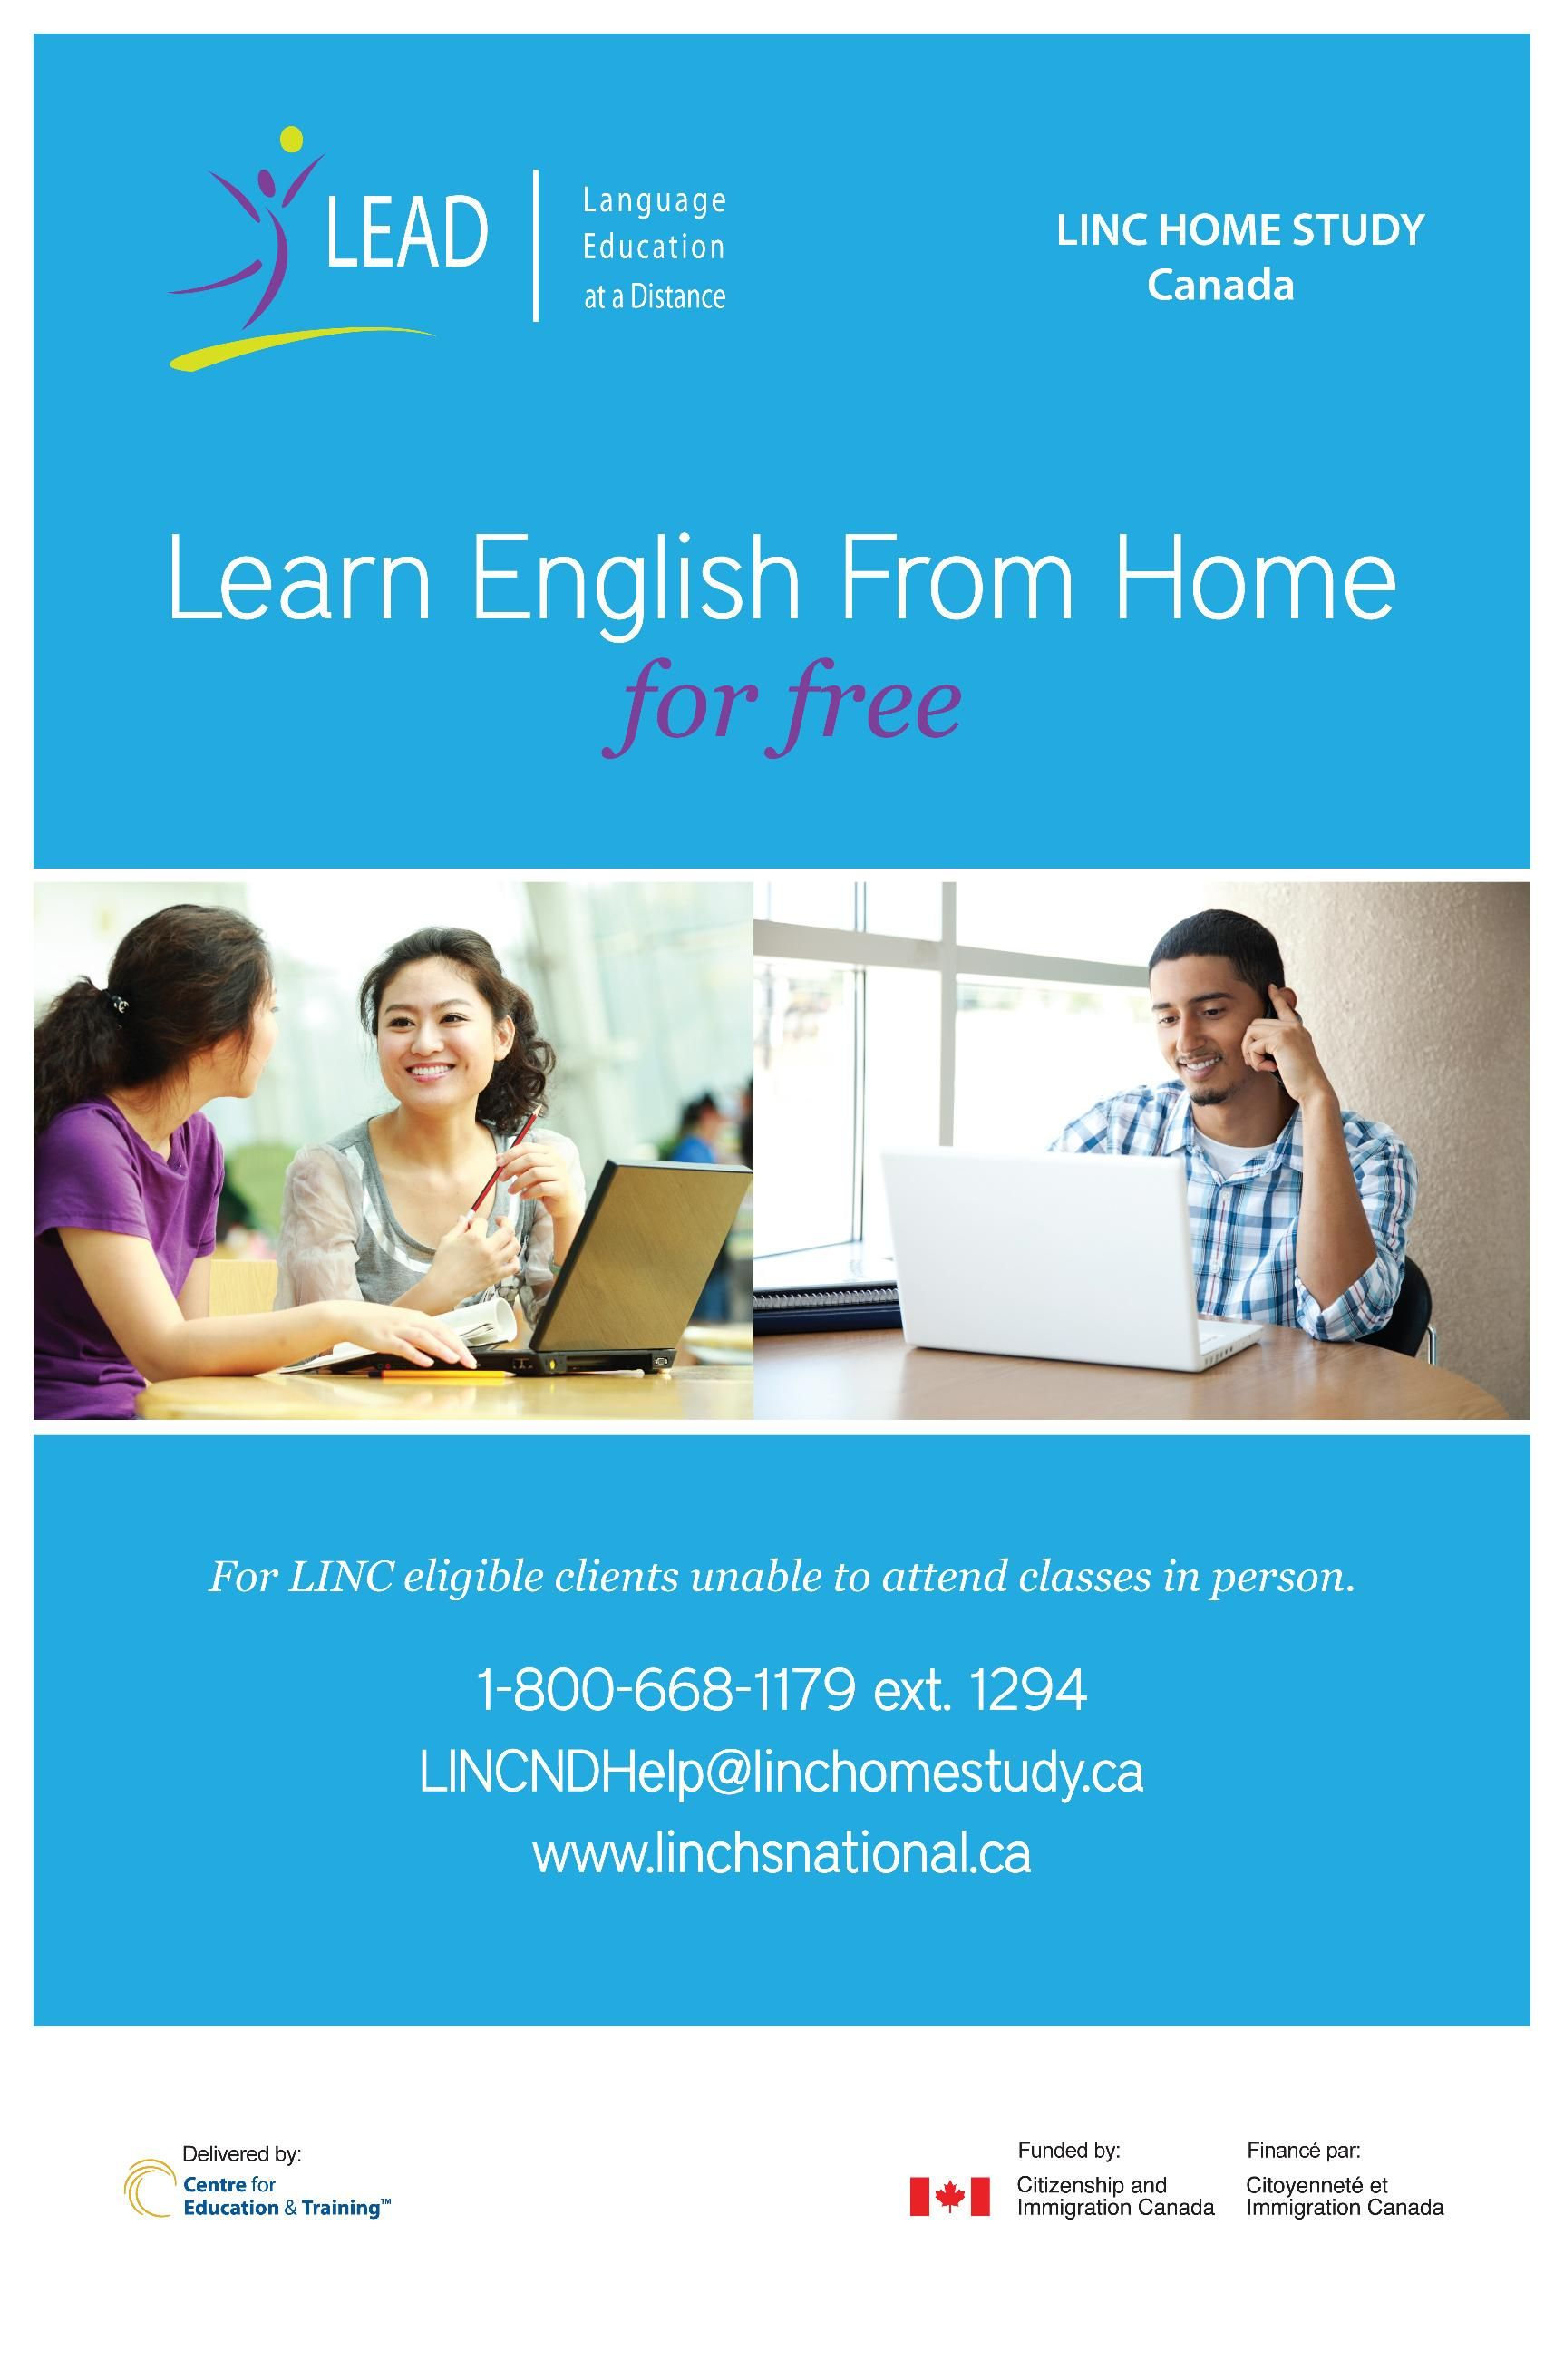 New language training program in Manitoba - LINC Home Study